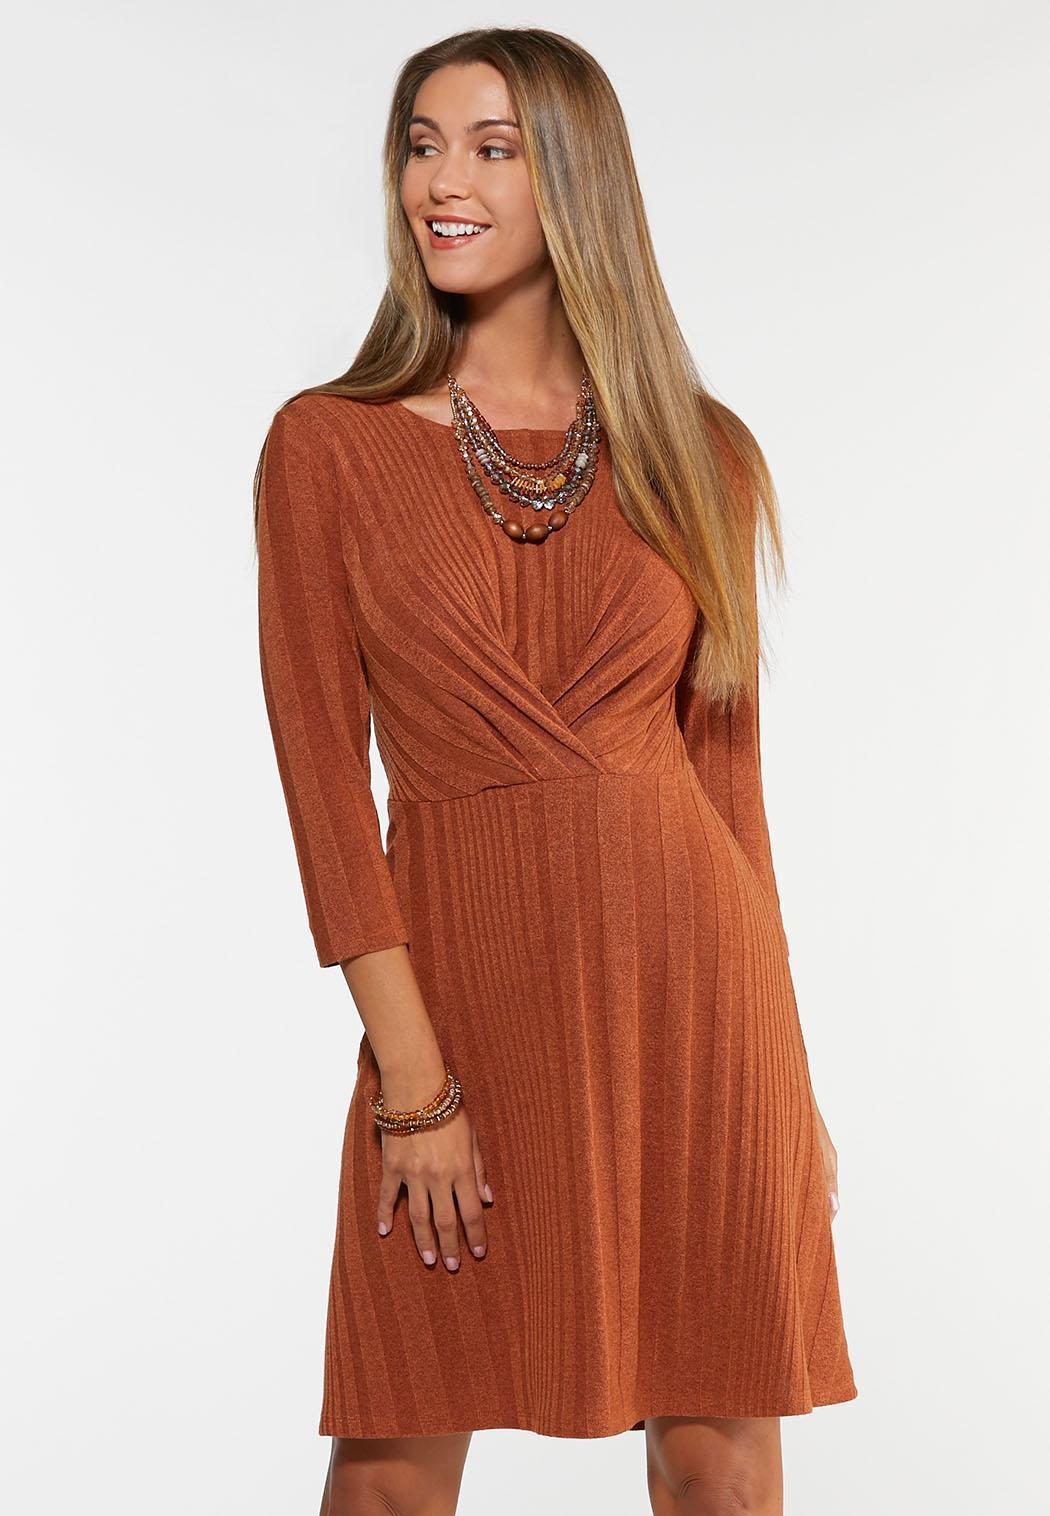 Plus Size Maxi Dresses Petite Length